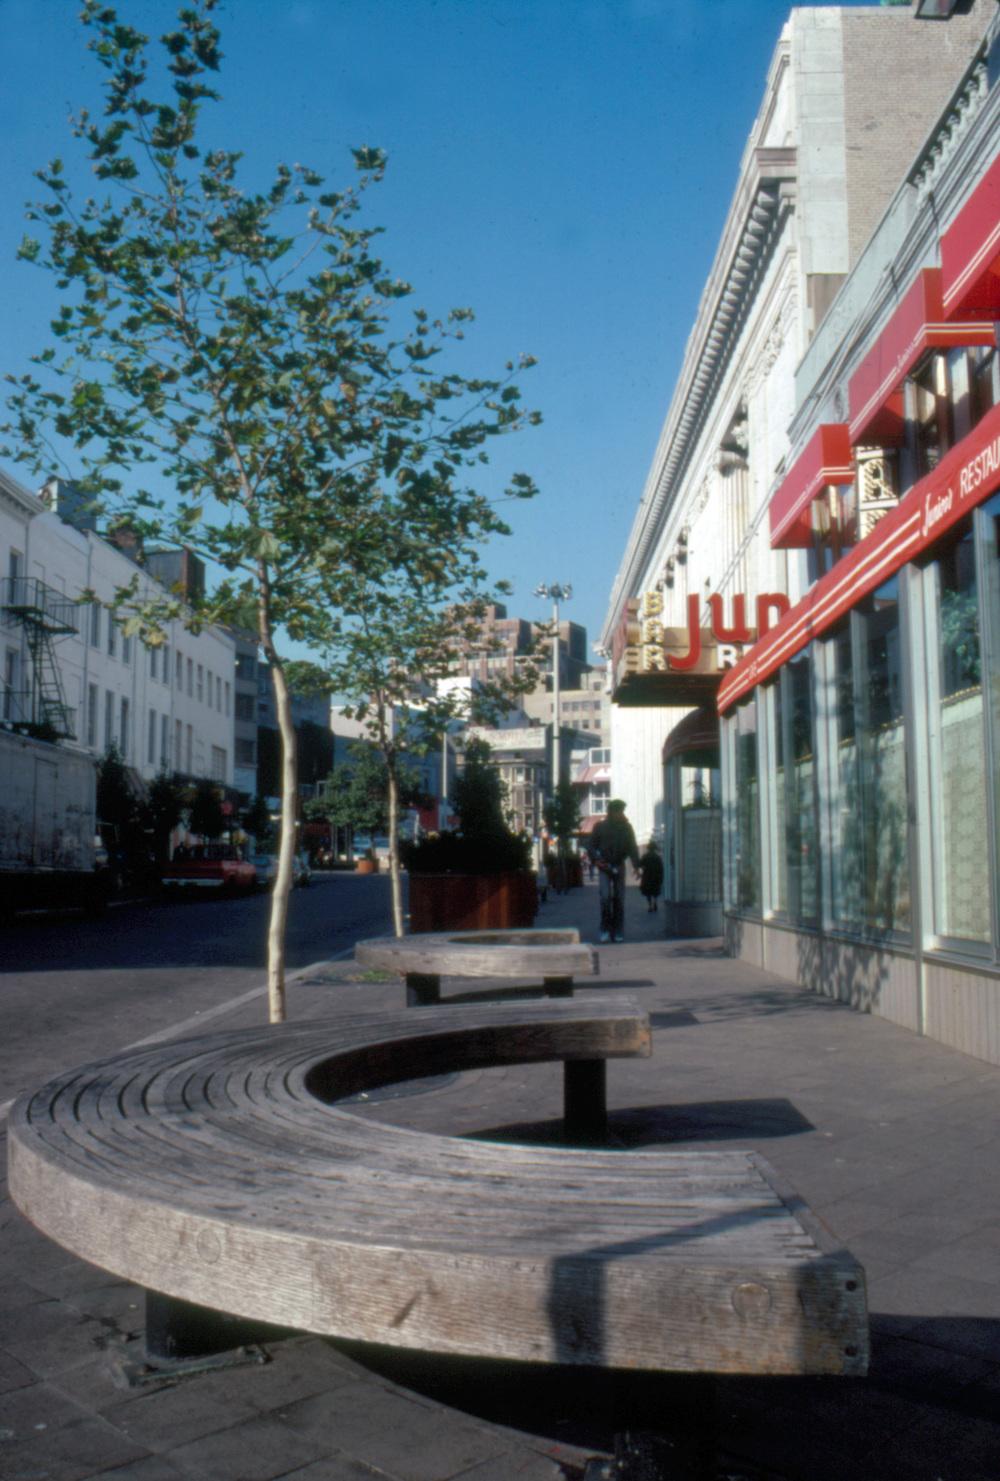 Fulton Street Mall Slide03 - Completed.jpg